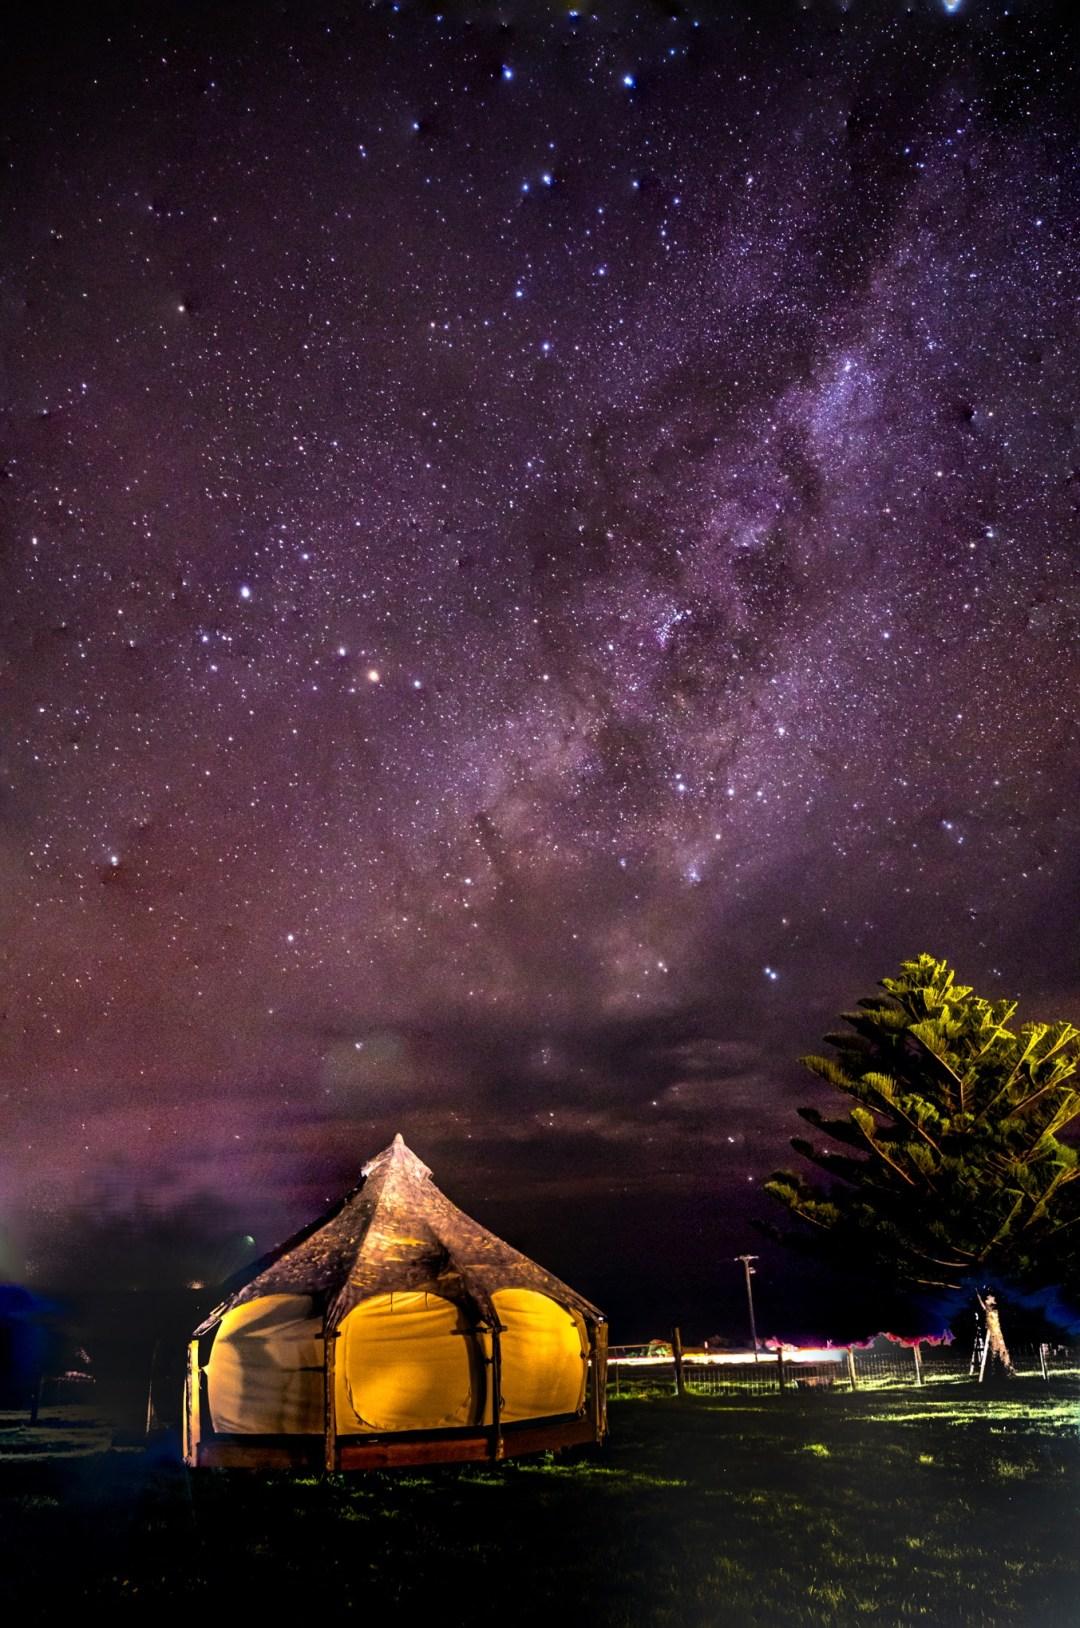 Seacroft Estate Lotus Bell Tent at Night